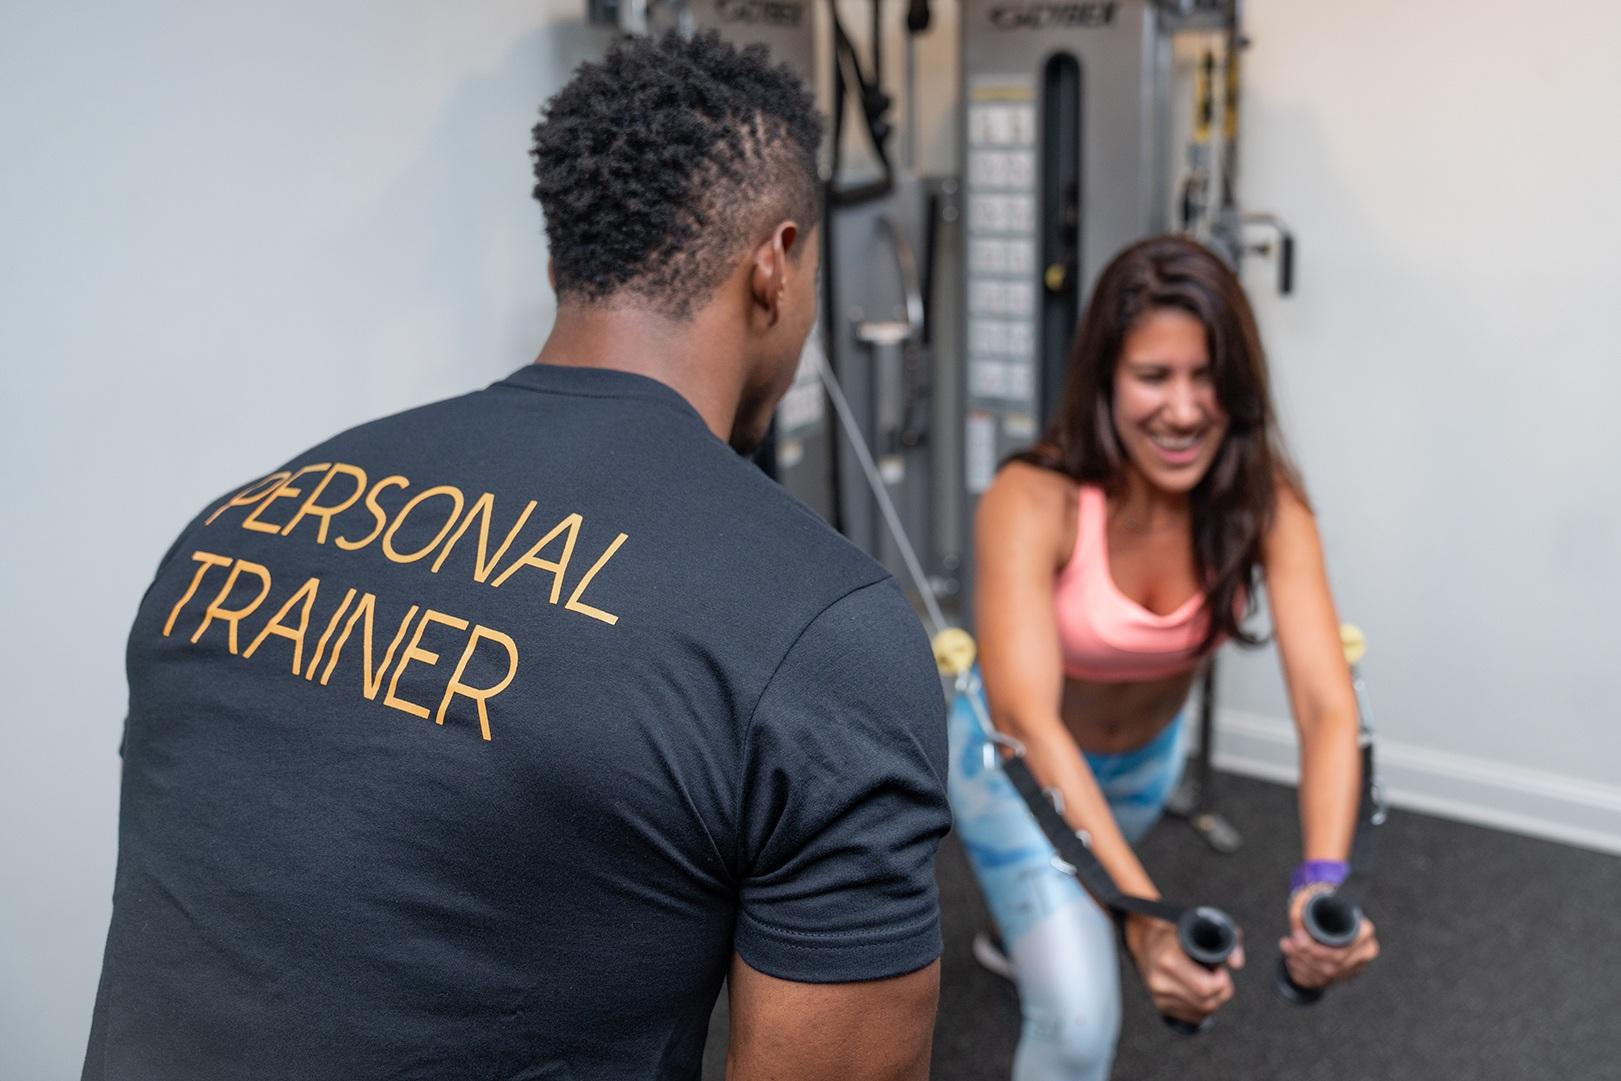 2018+Fitness+Hub+Group+Personal+Training-14_reduced.jpg